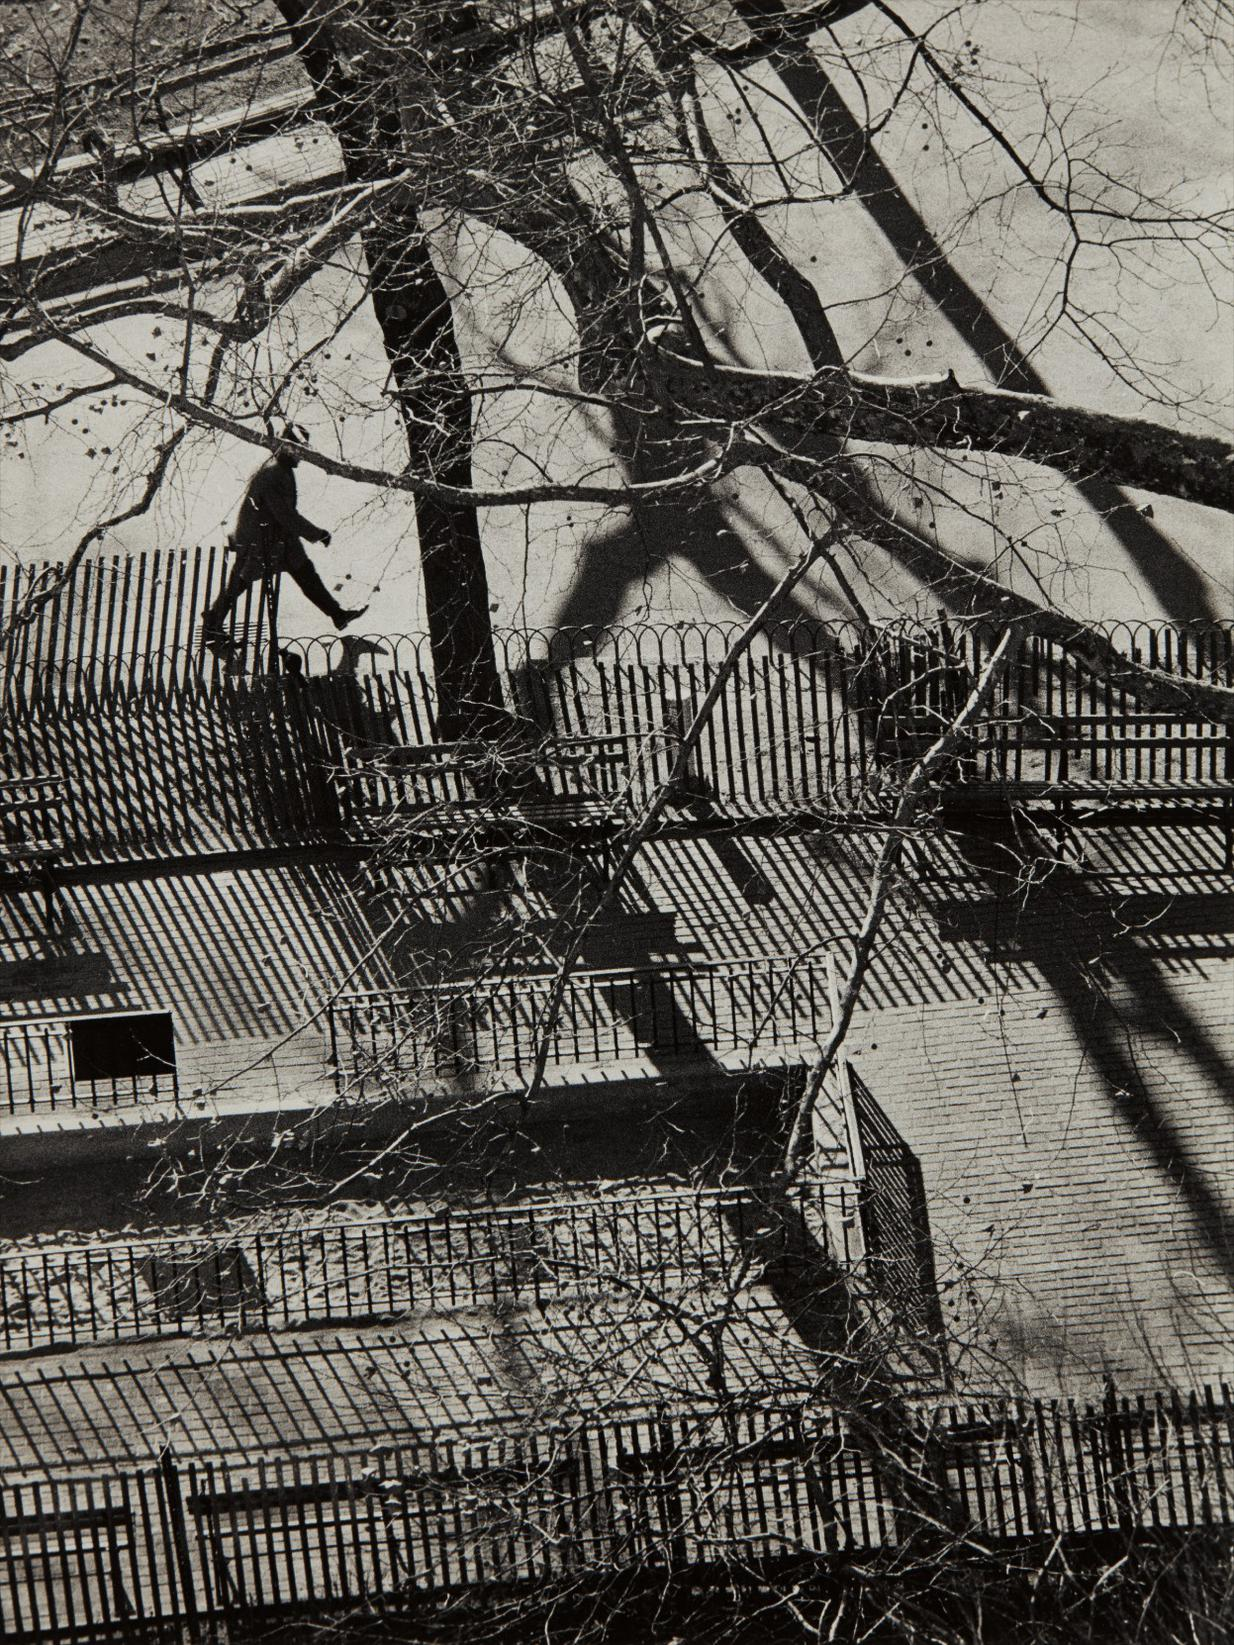 Andre Kertesz-Washington Square Park, November 30-1971